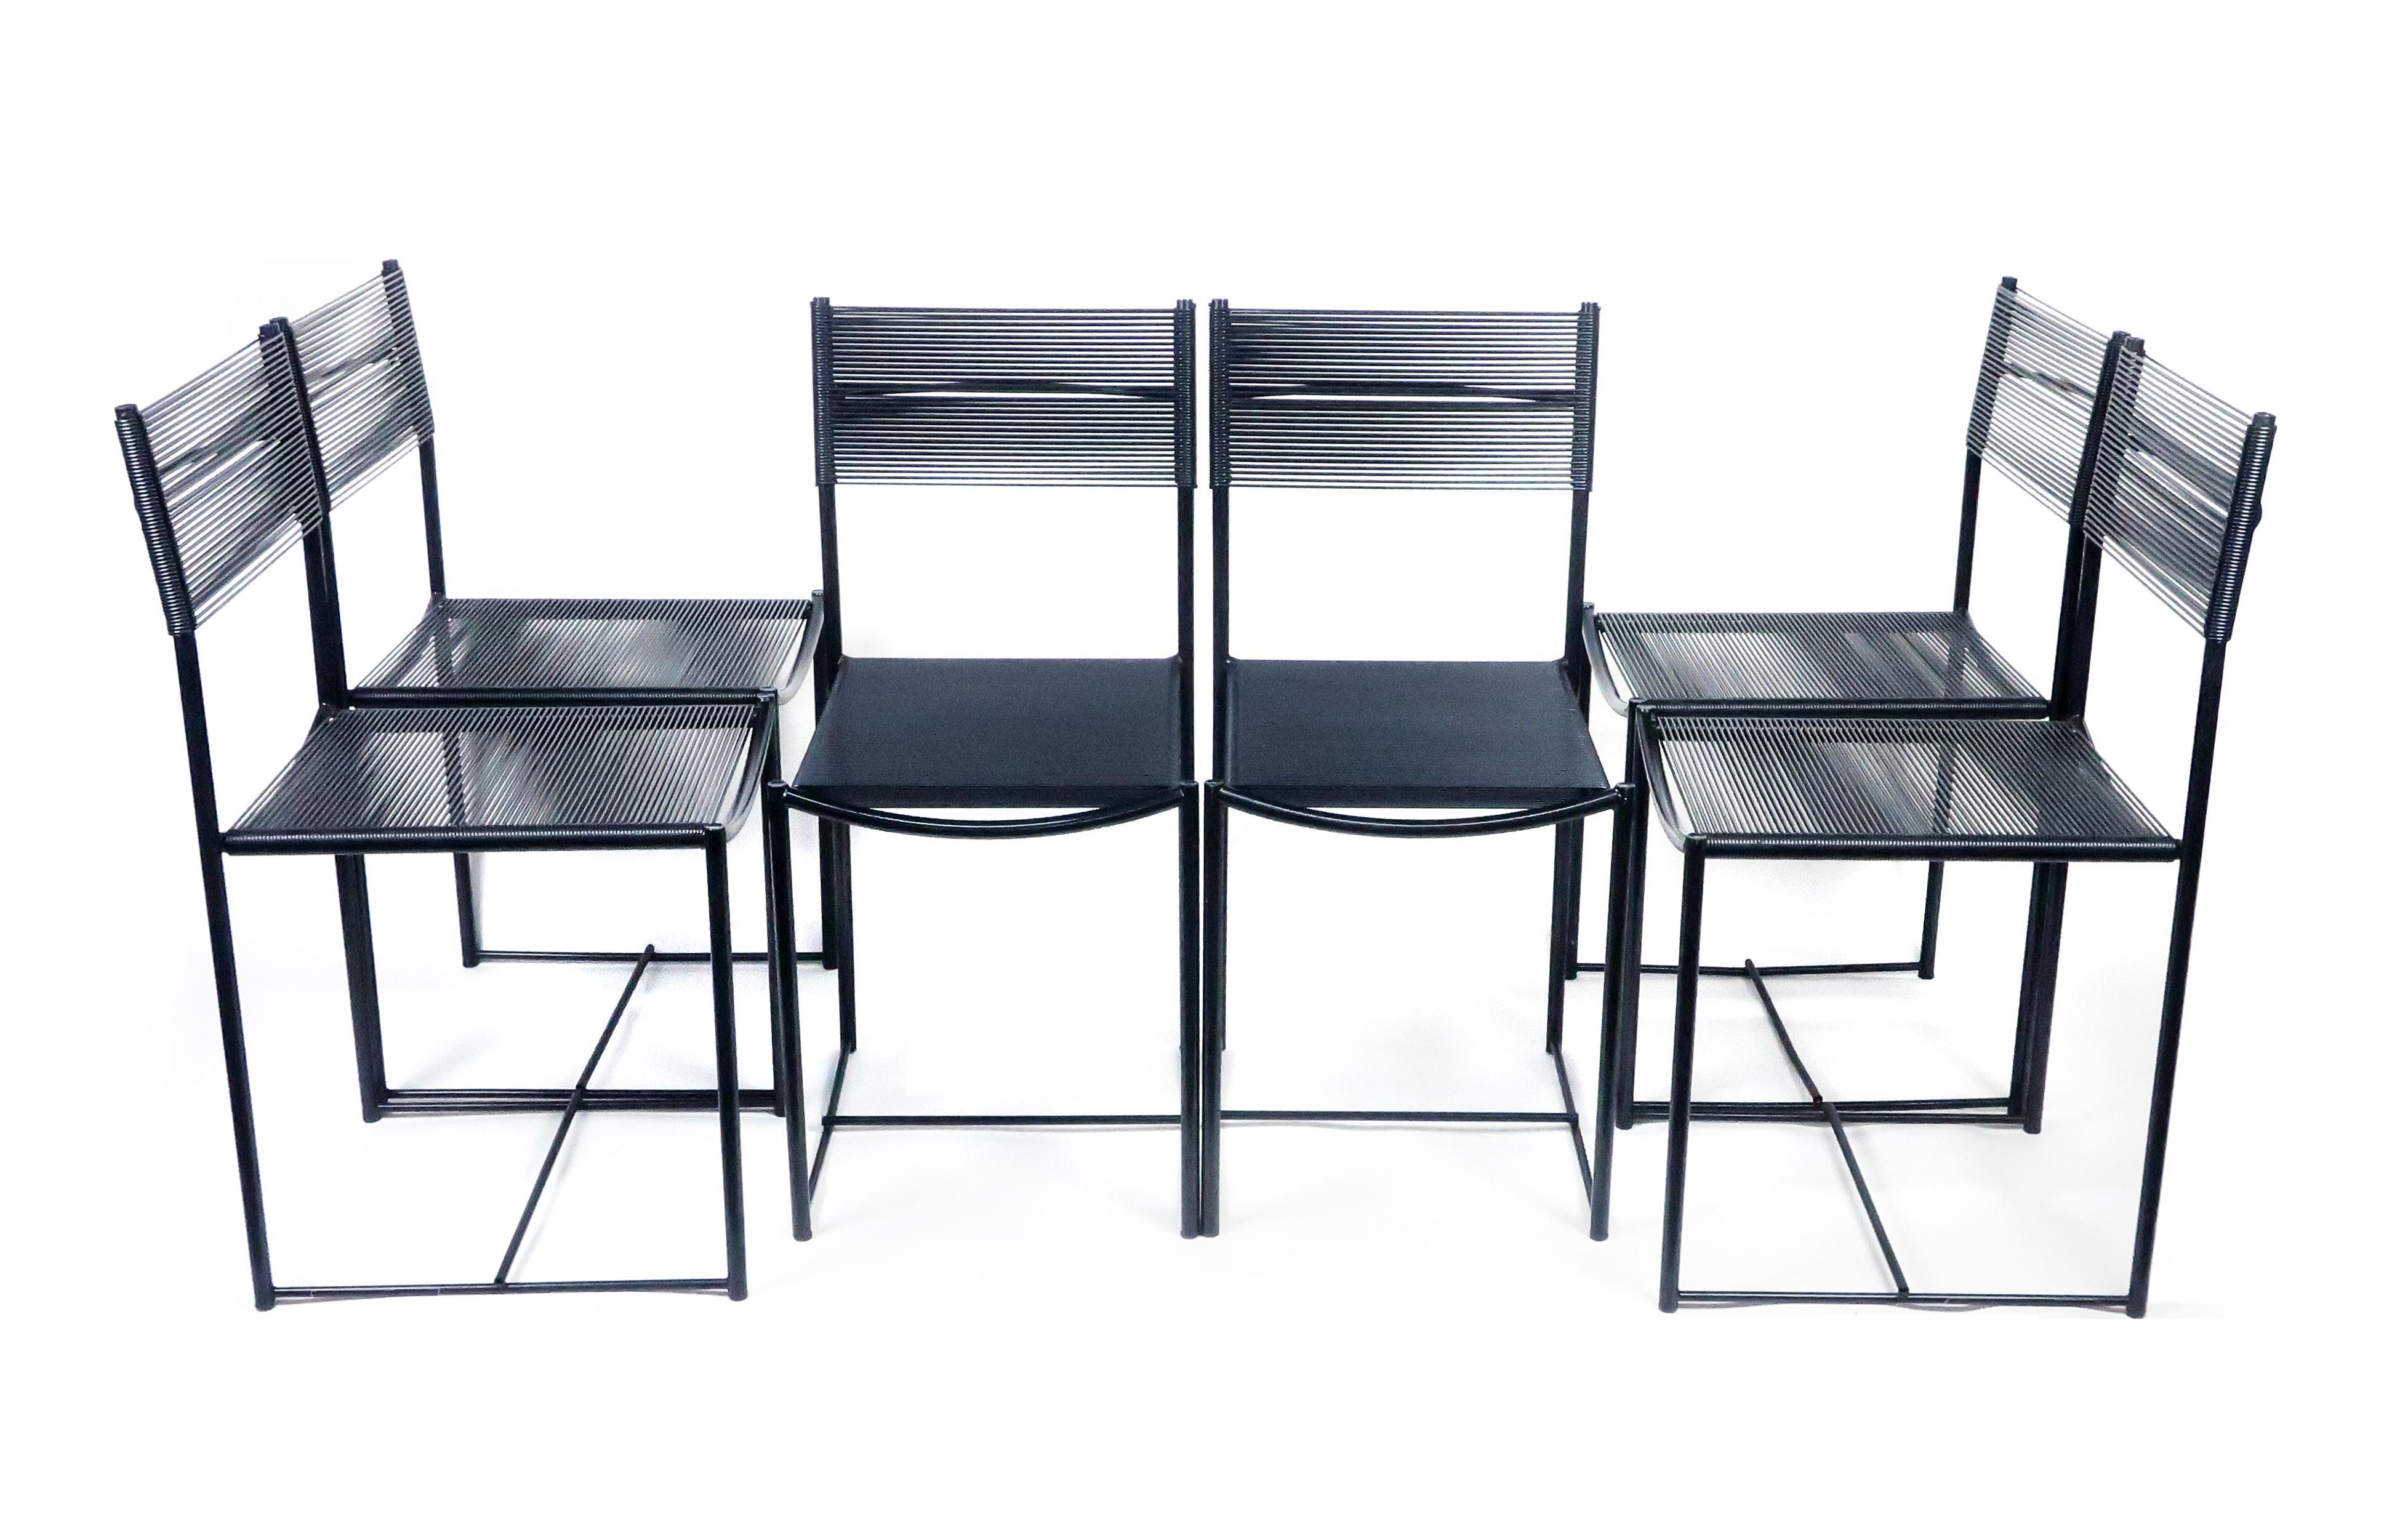 Spaghetti Chair Giandomenico Belotti.Six Spaghetti Dining Chairs By Giandomenico Belotti For Alias